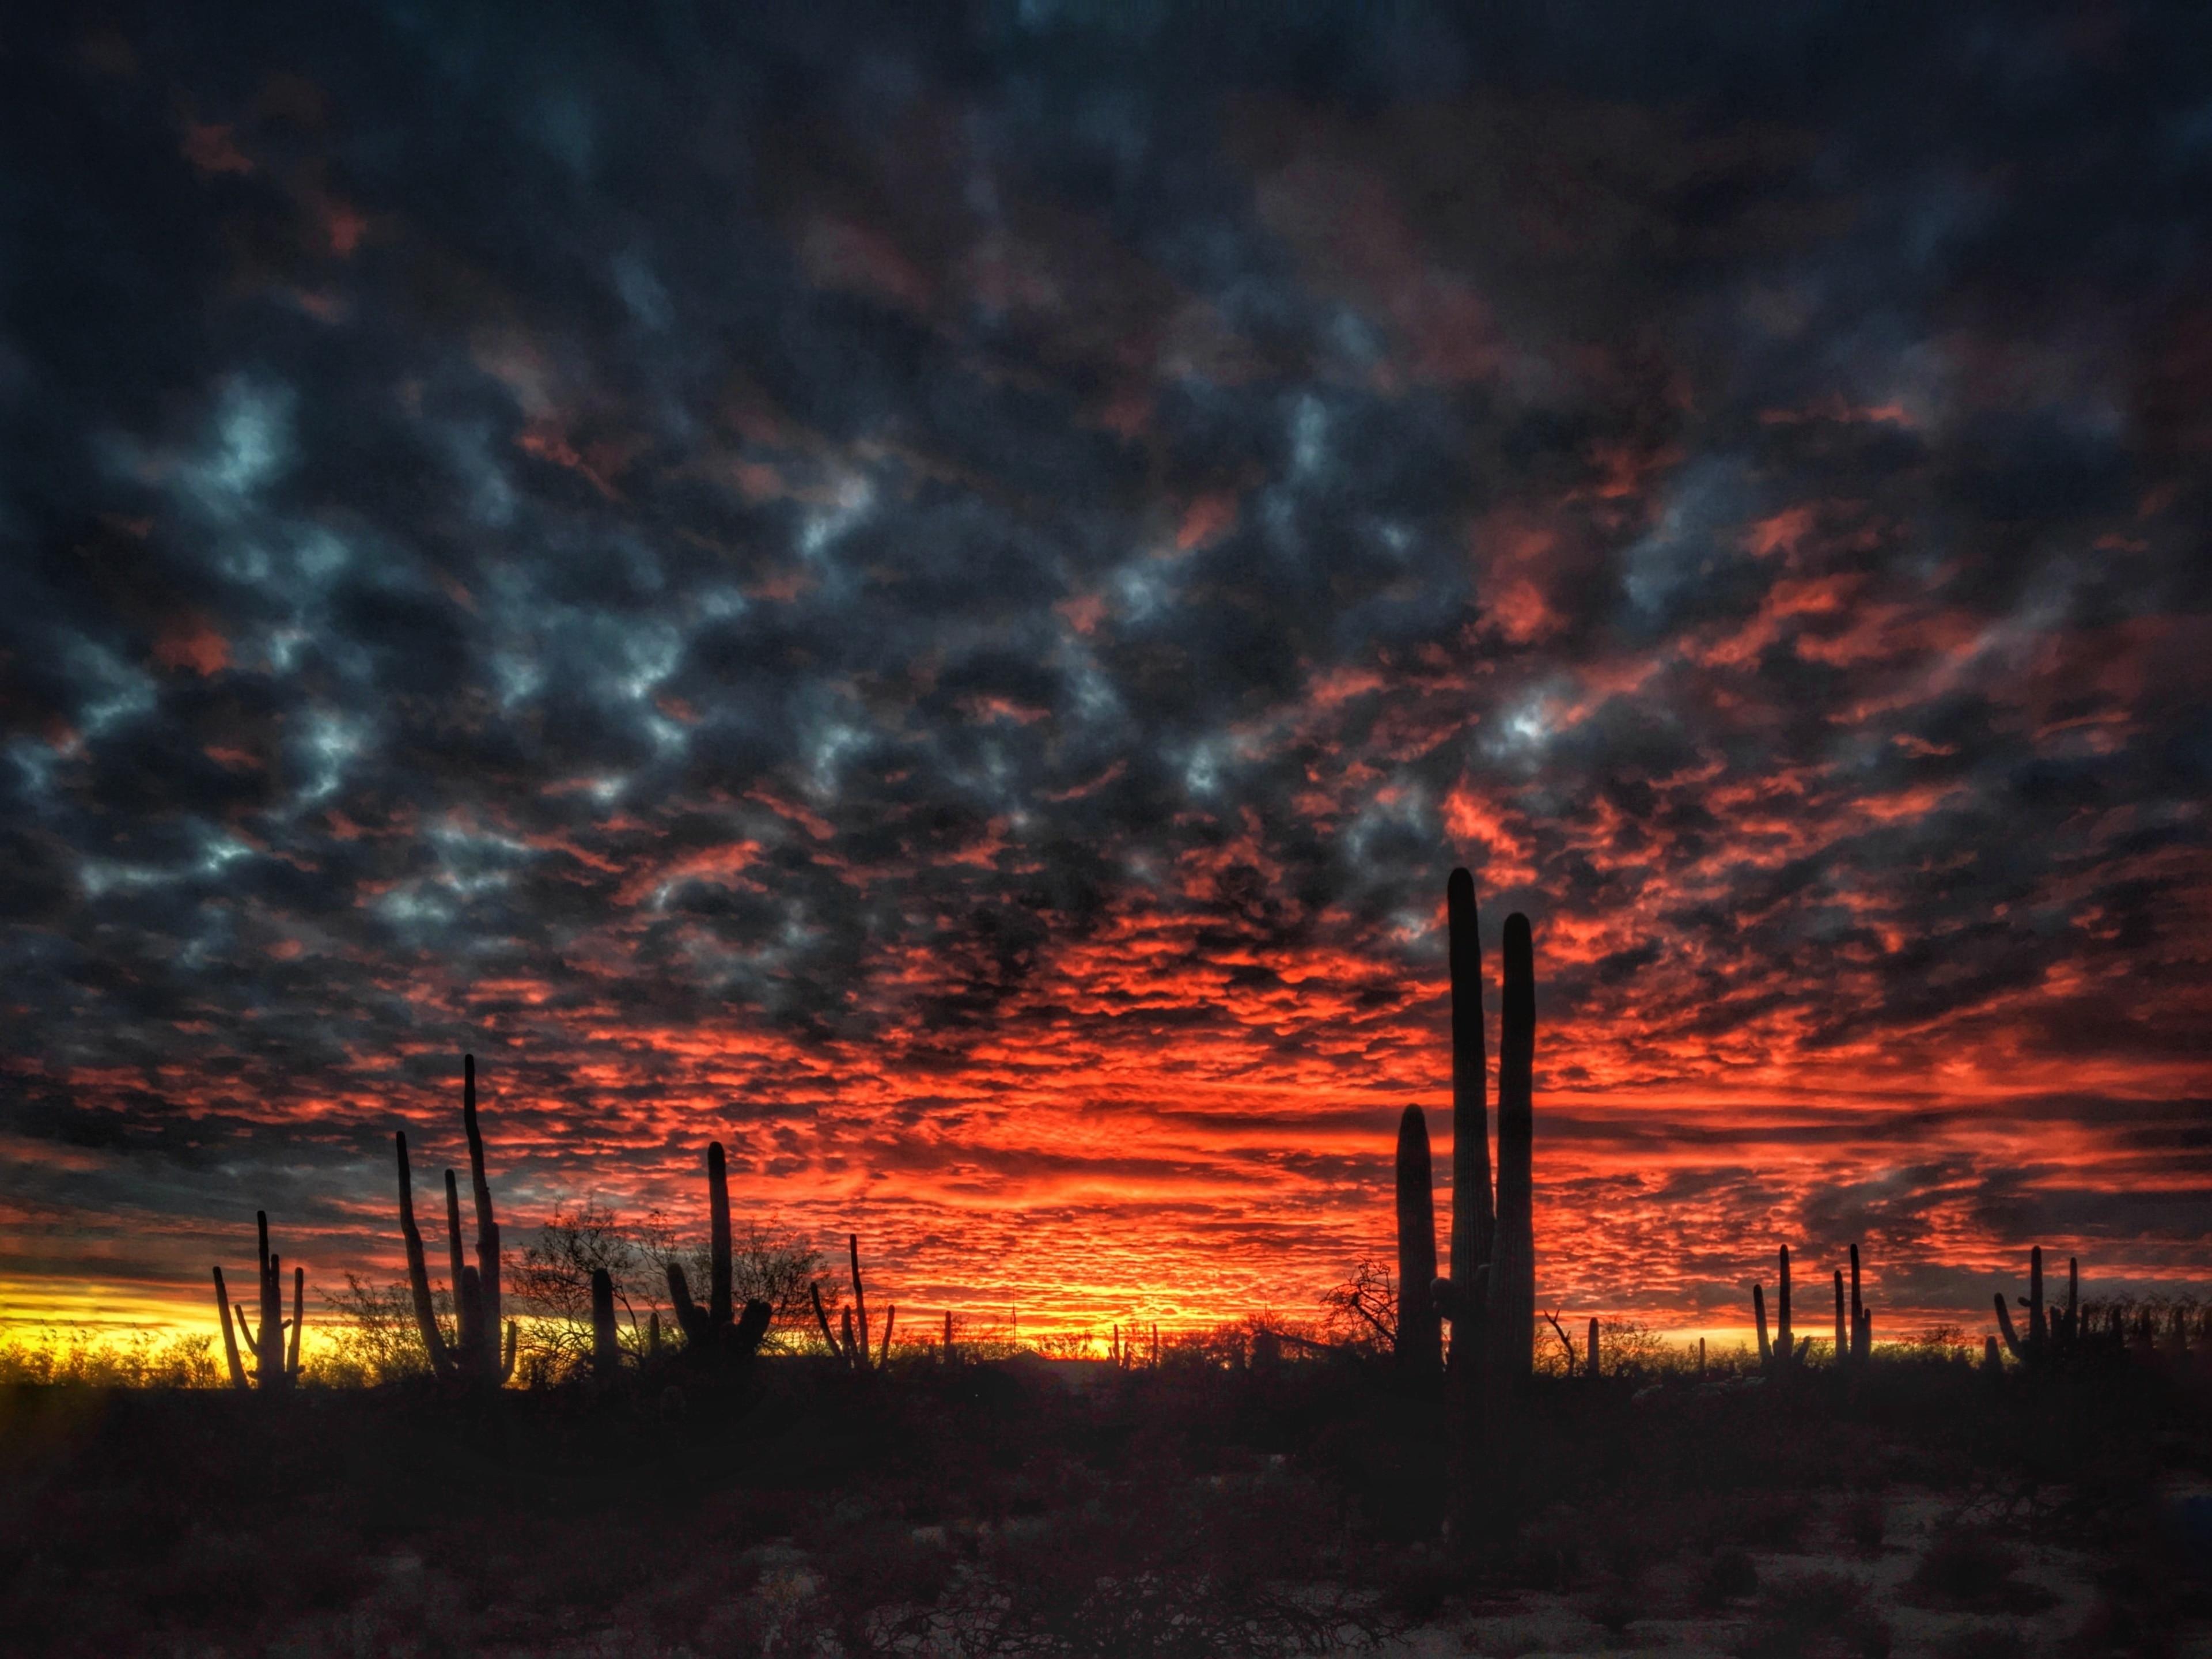 Catalina Foothills, Arizona, United States of America